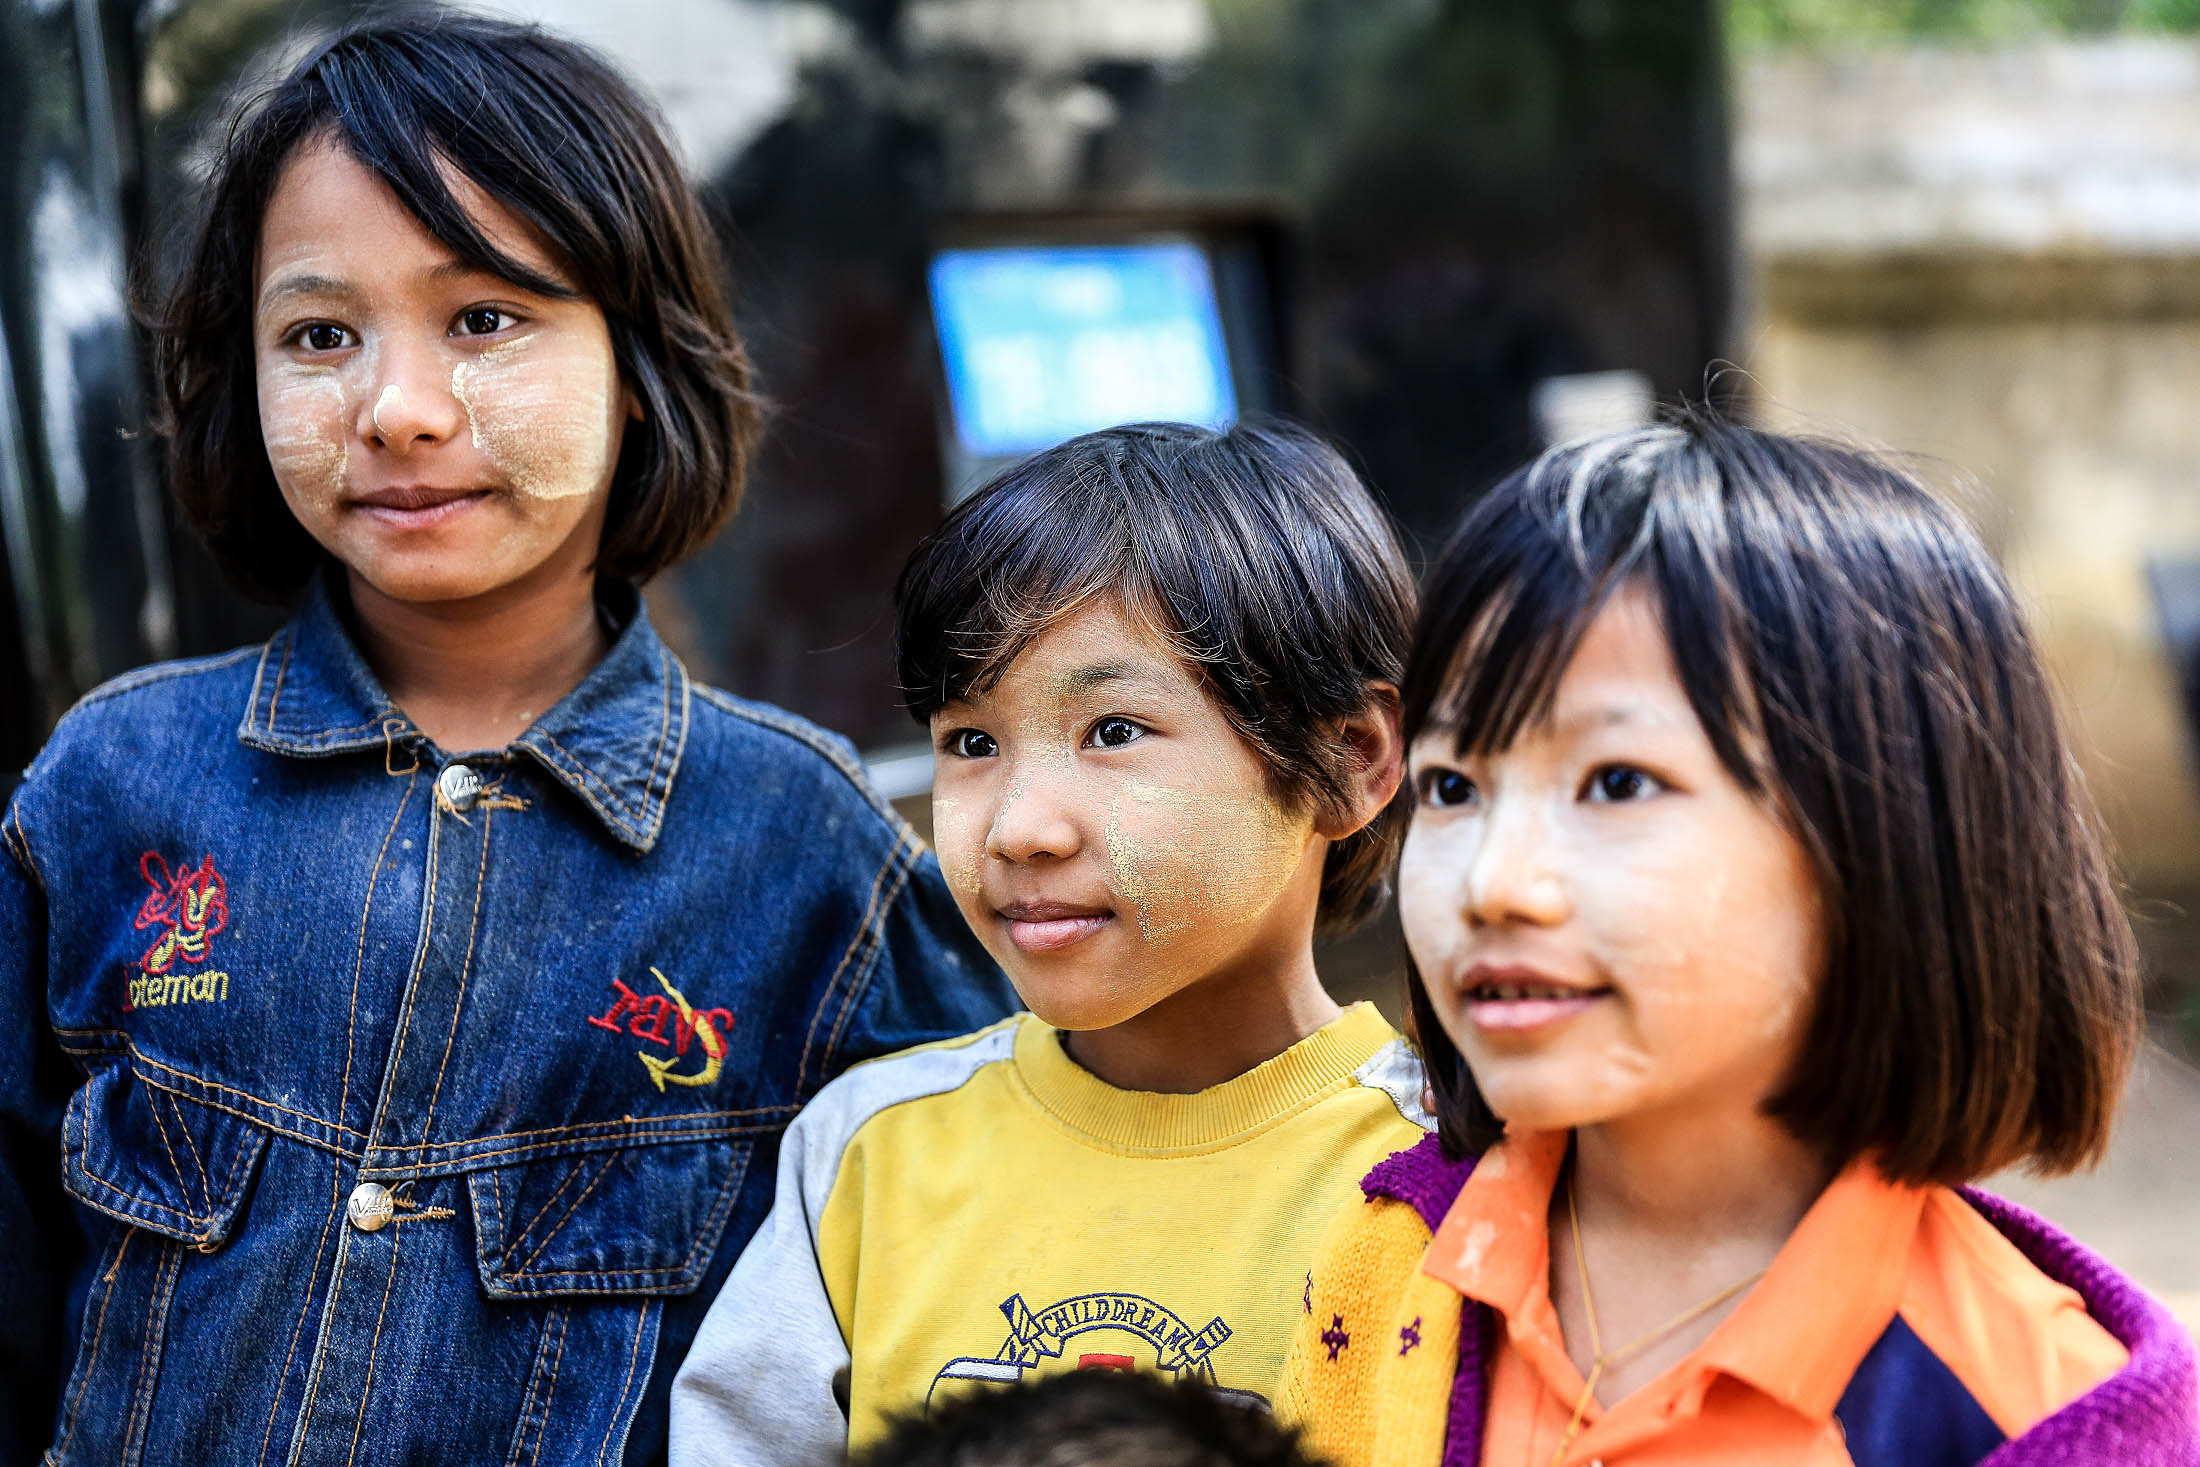 Kids of Myanmar